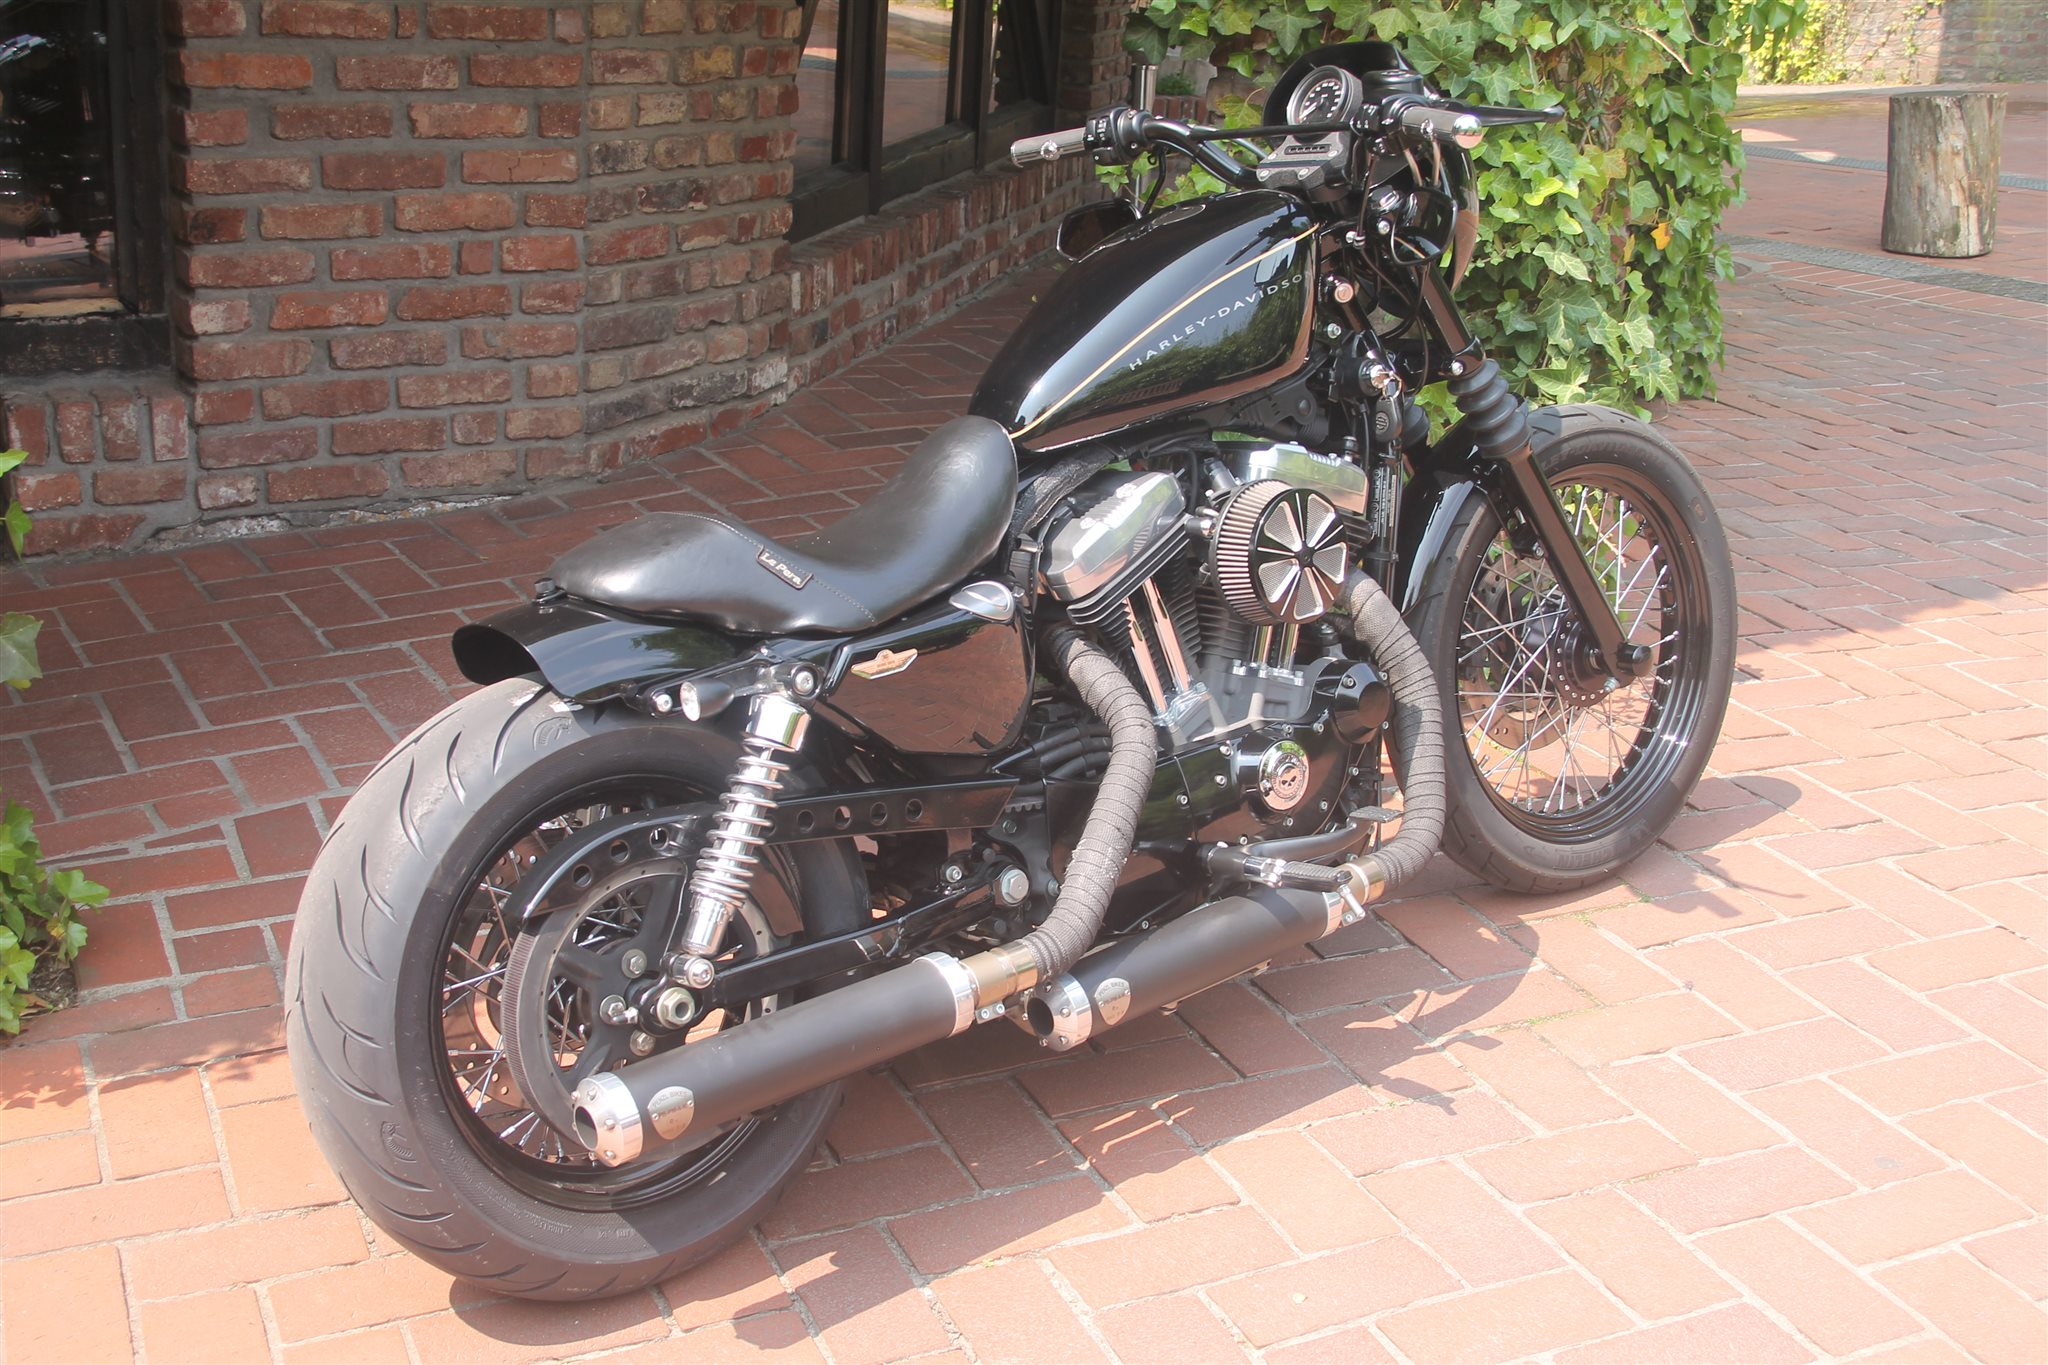 Umgebautes Motorrad Harley Davidson Sportster Xl 1200 N Nightster Von X Trem Lotter Harley Import Custombikes 1000ps De